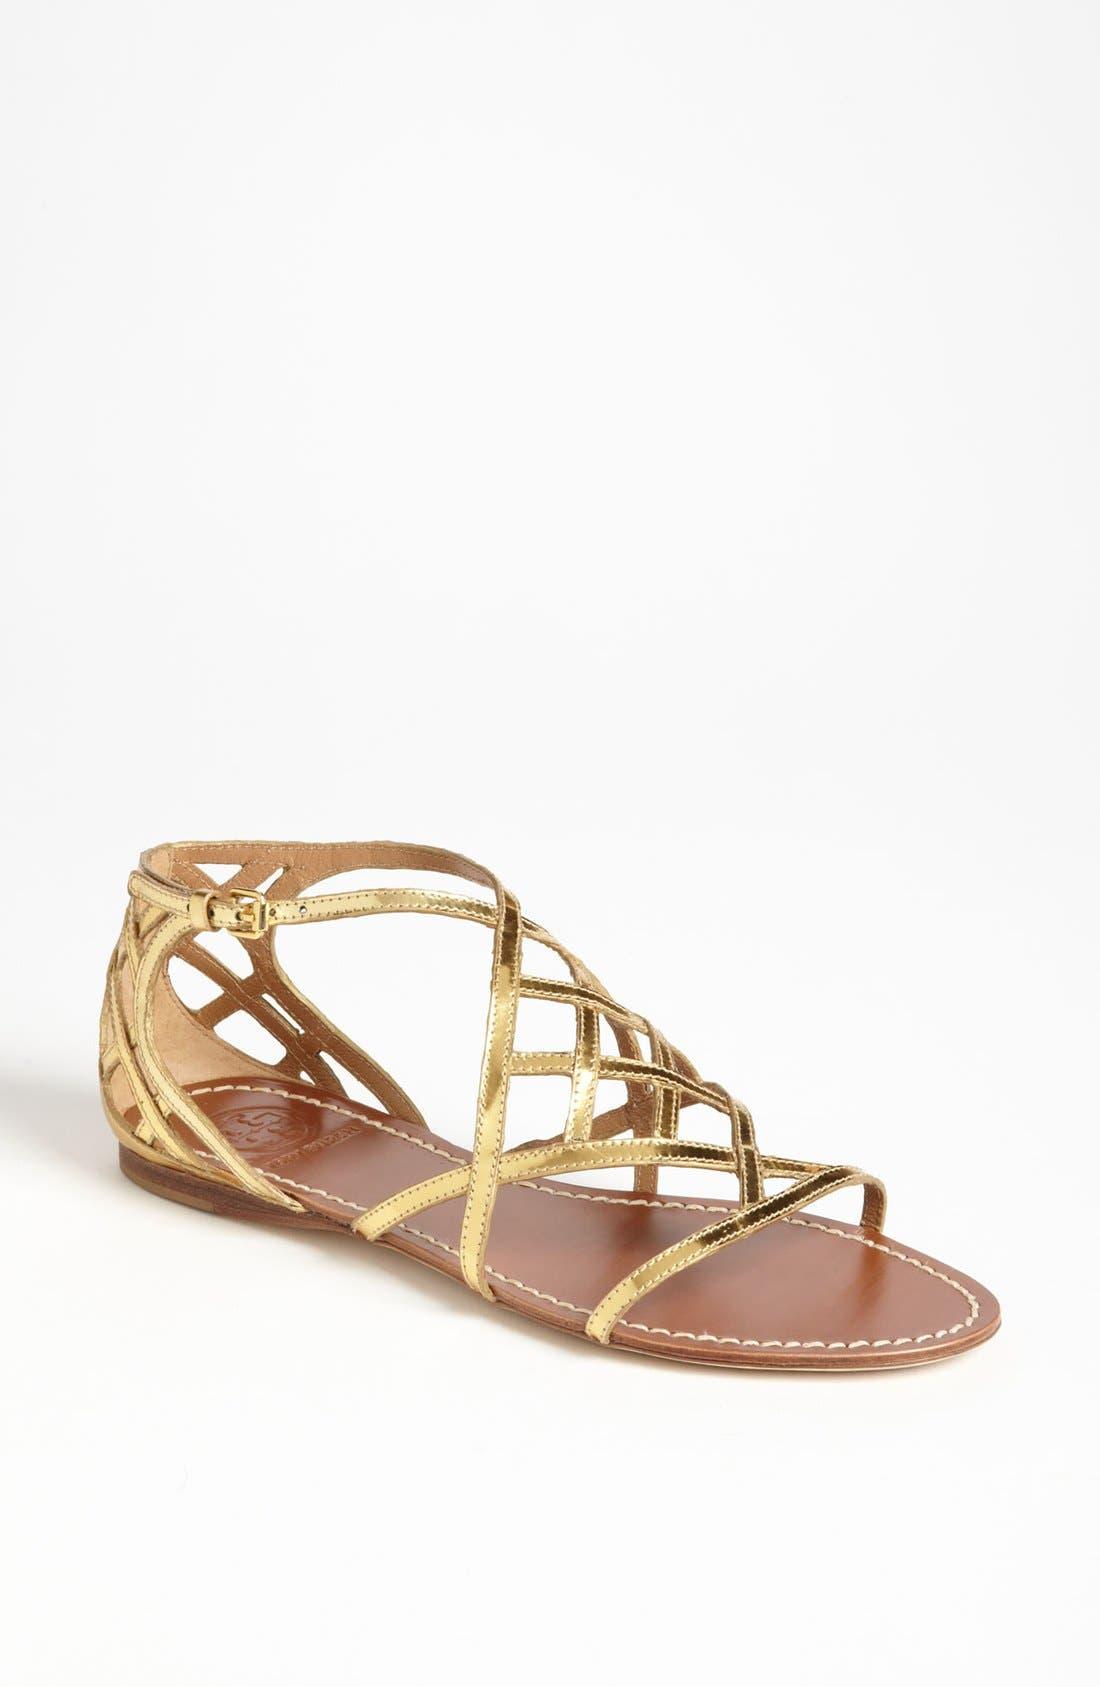 Main Image - Tory Burch 'Amalie' Sandal